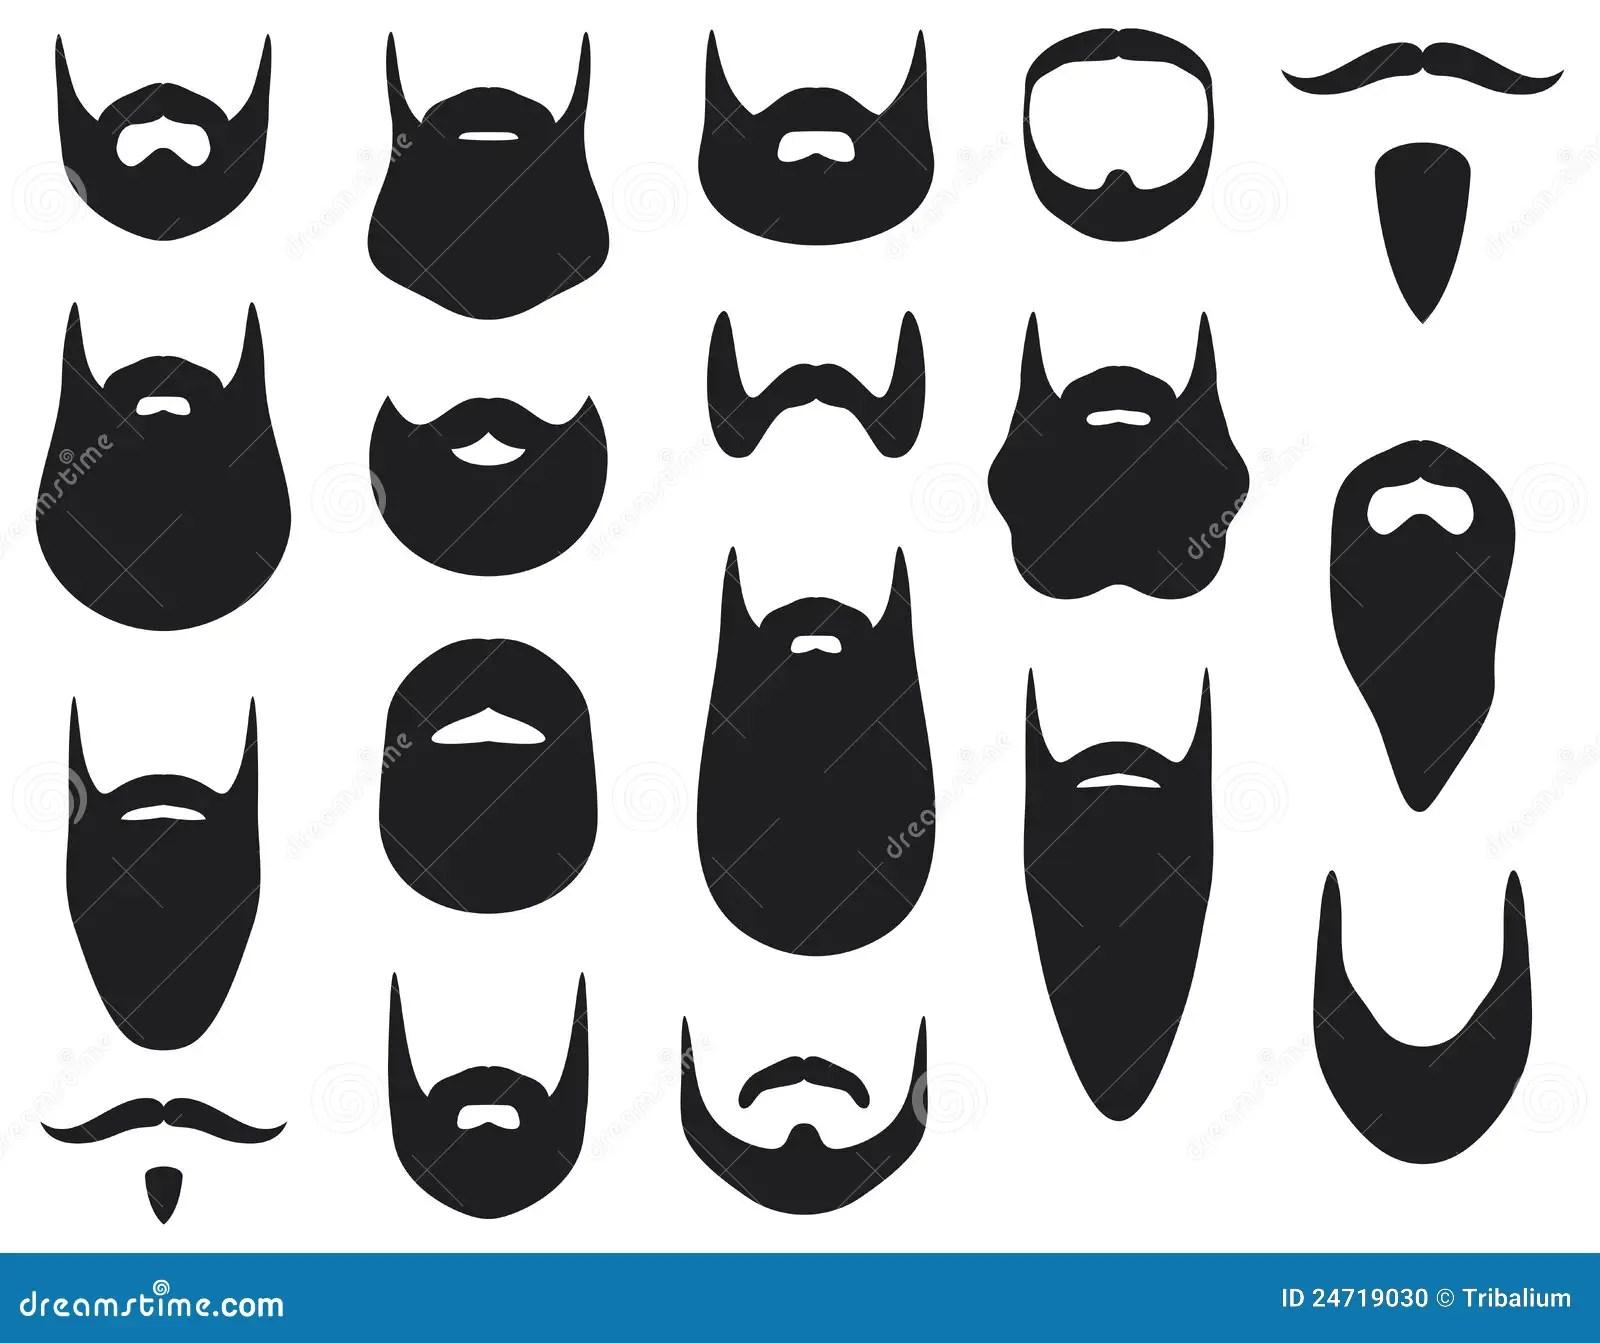 Beard Stock Vector Image Of Black Silhouette Costume